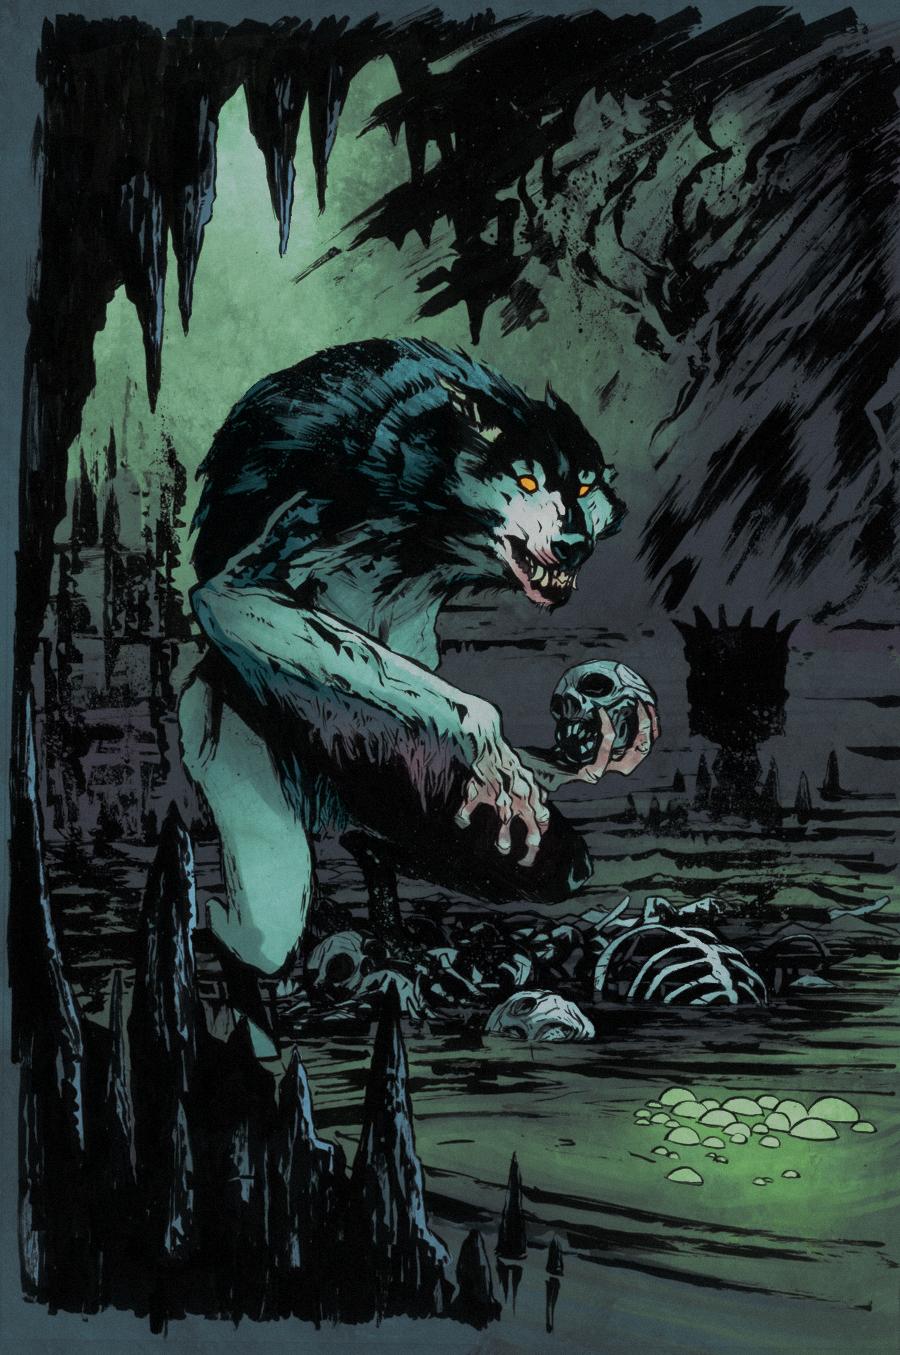 Querio werewolf by SpicerColor